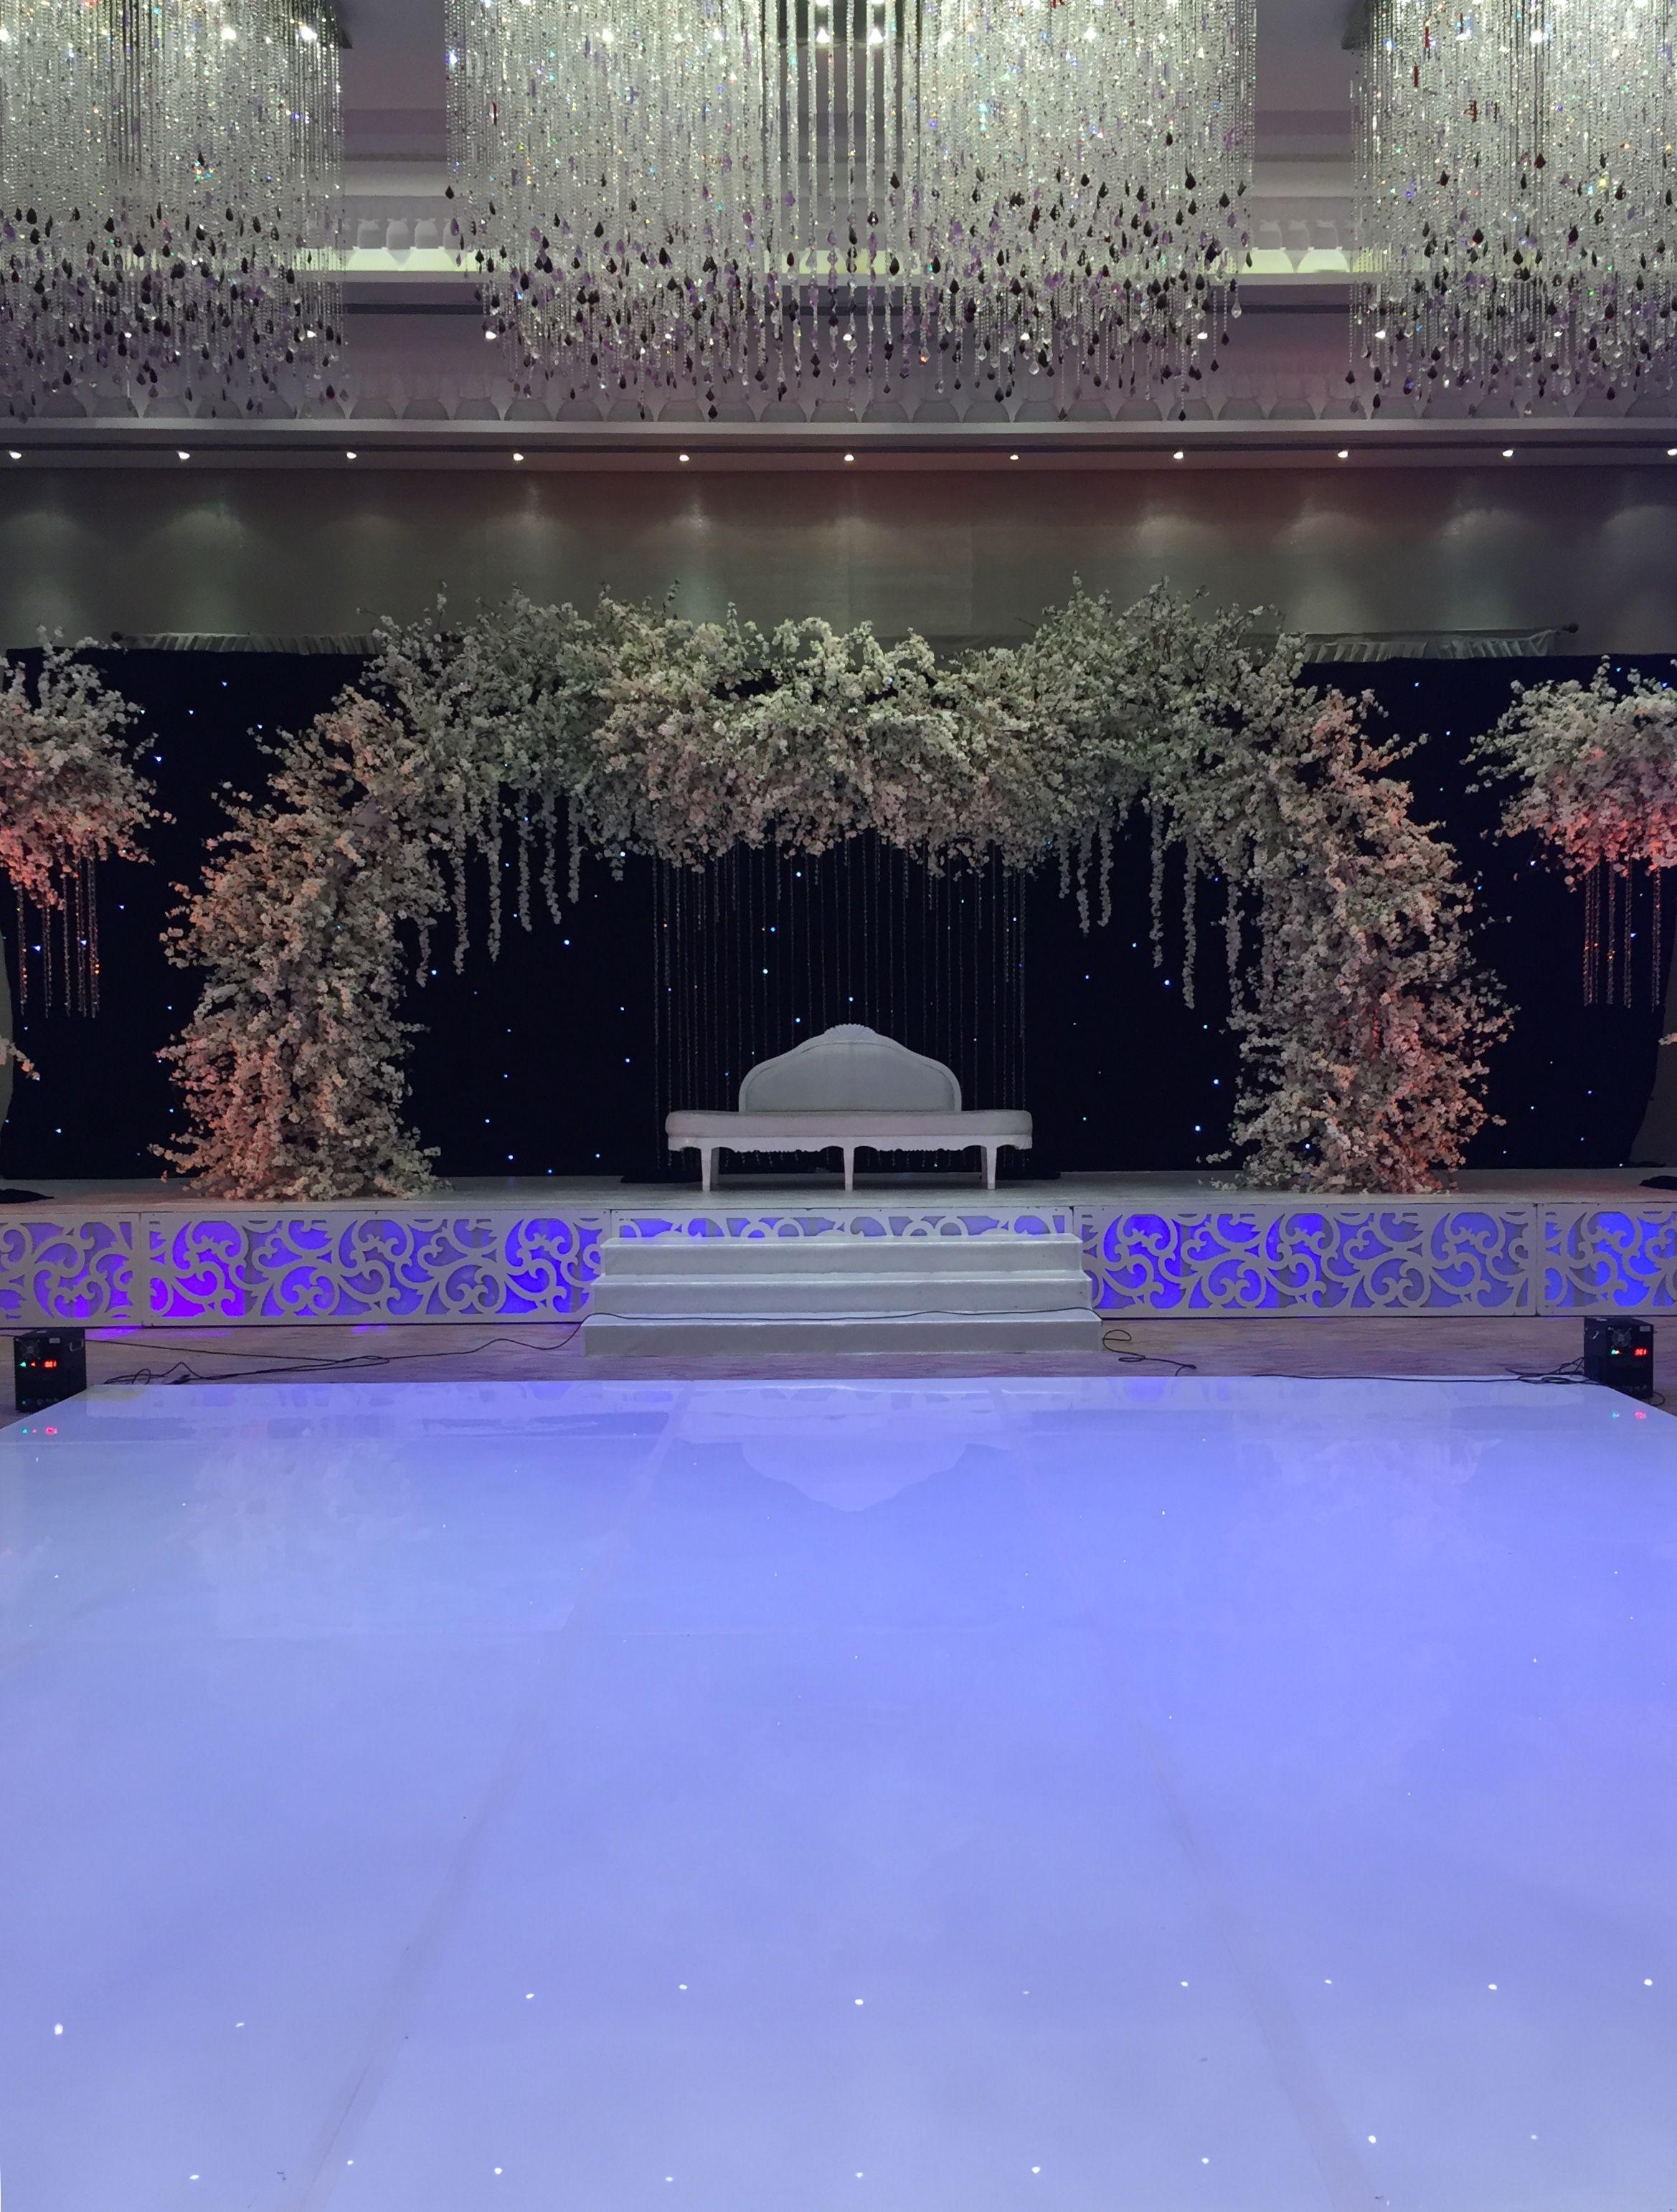 Wedding stage decoration dubai  Pin by Franky Adrian on Wedding Stage Decorations  Pinterest